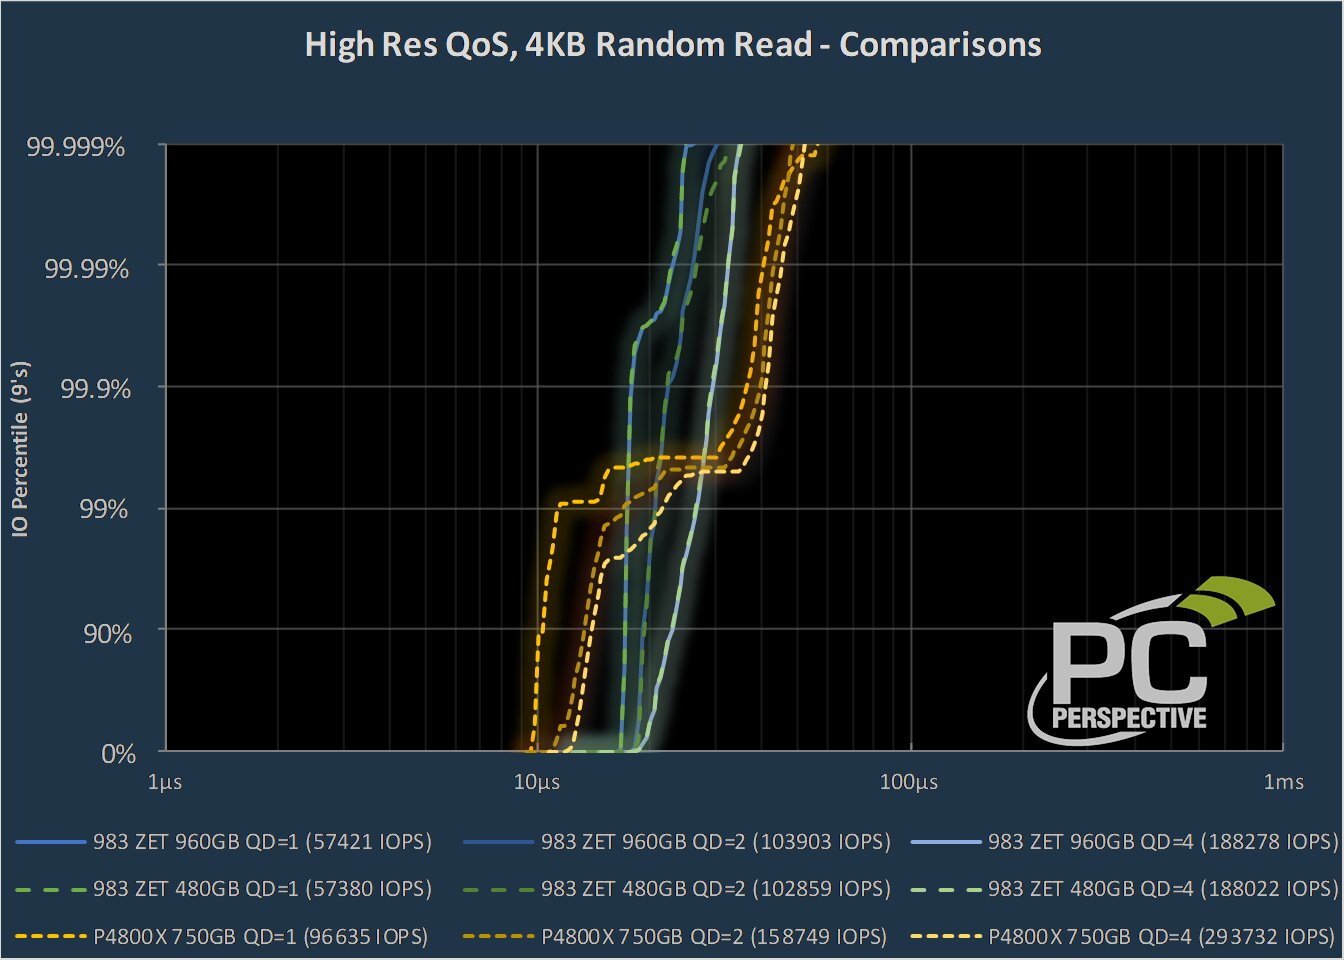 Samsung Z-SSD vs. Intel Optane (4K Random Read, QoS)